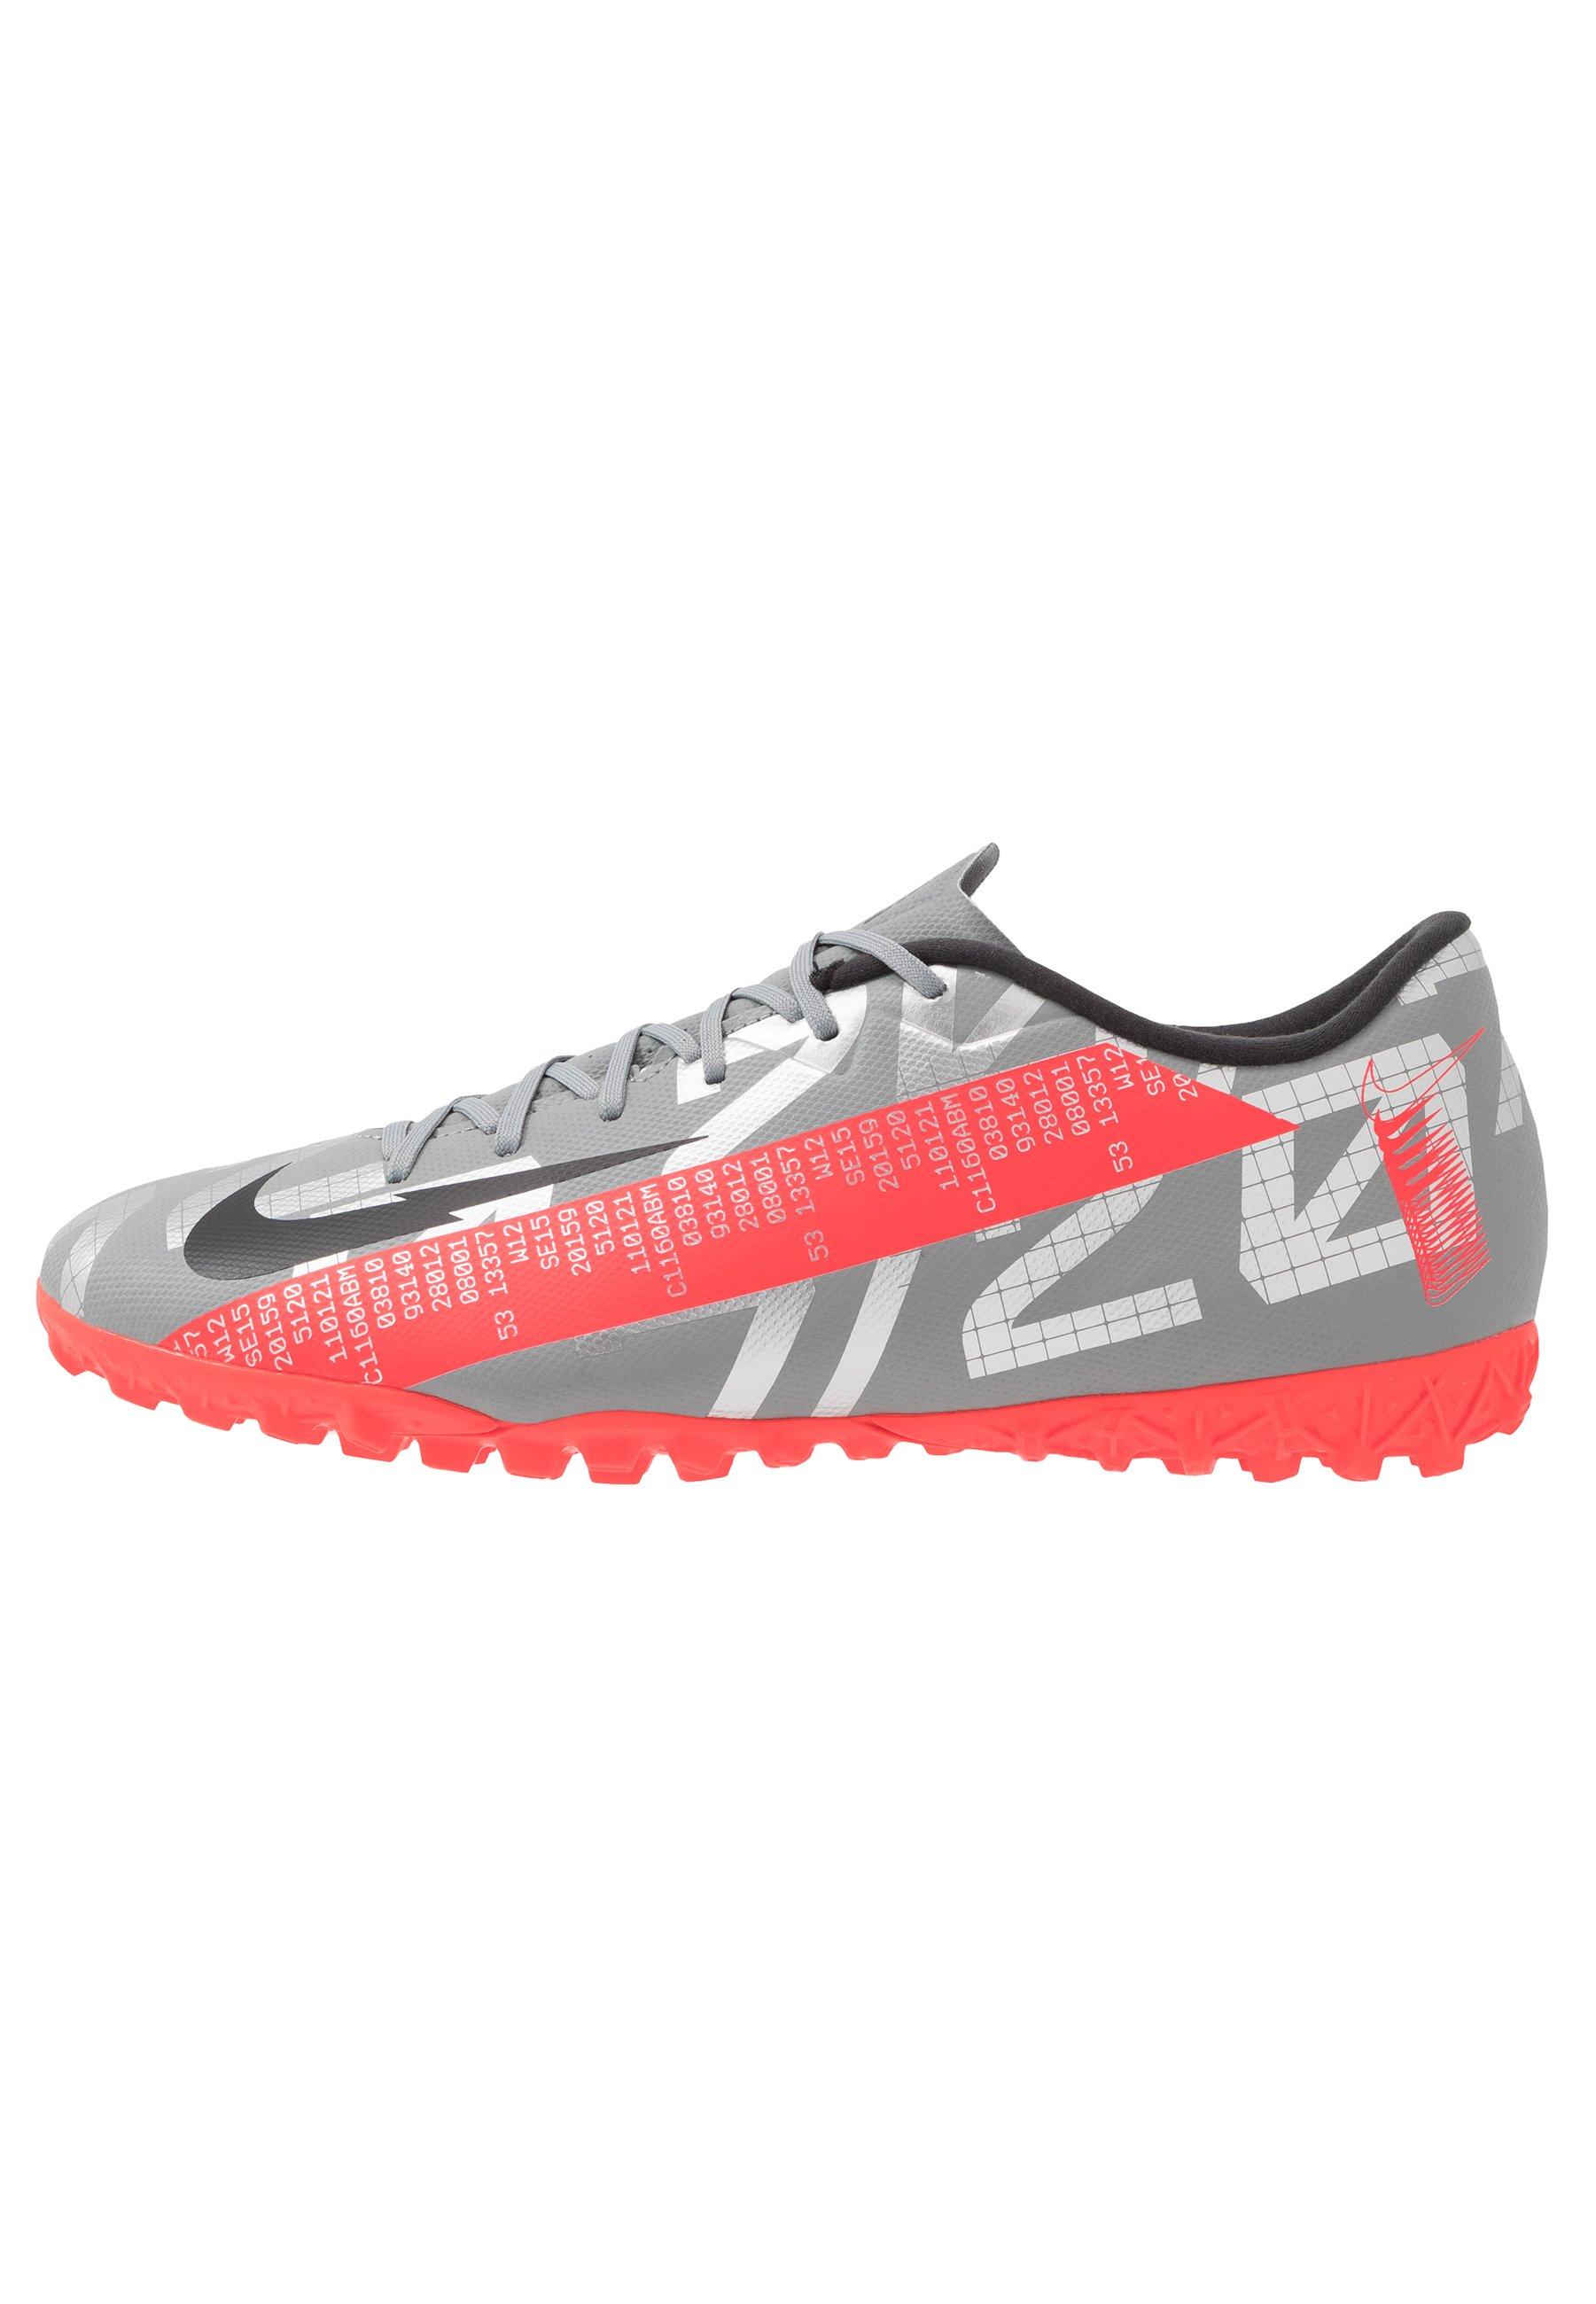 MERCURIAL VAPOR 13 ACADEMY TF Chaussures de foot multicrampons metallic bomber greyblackparticle grey